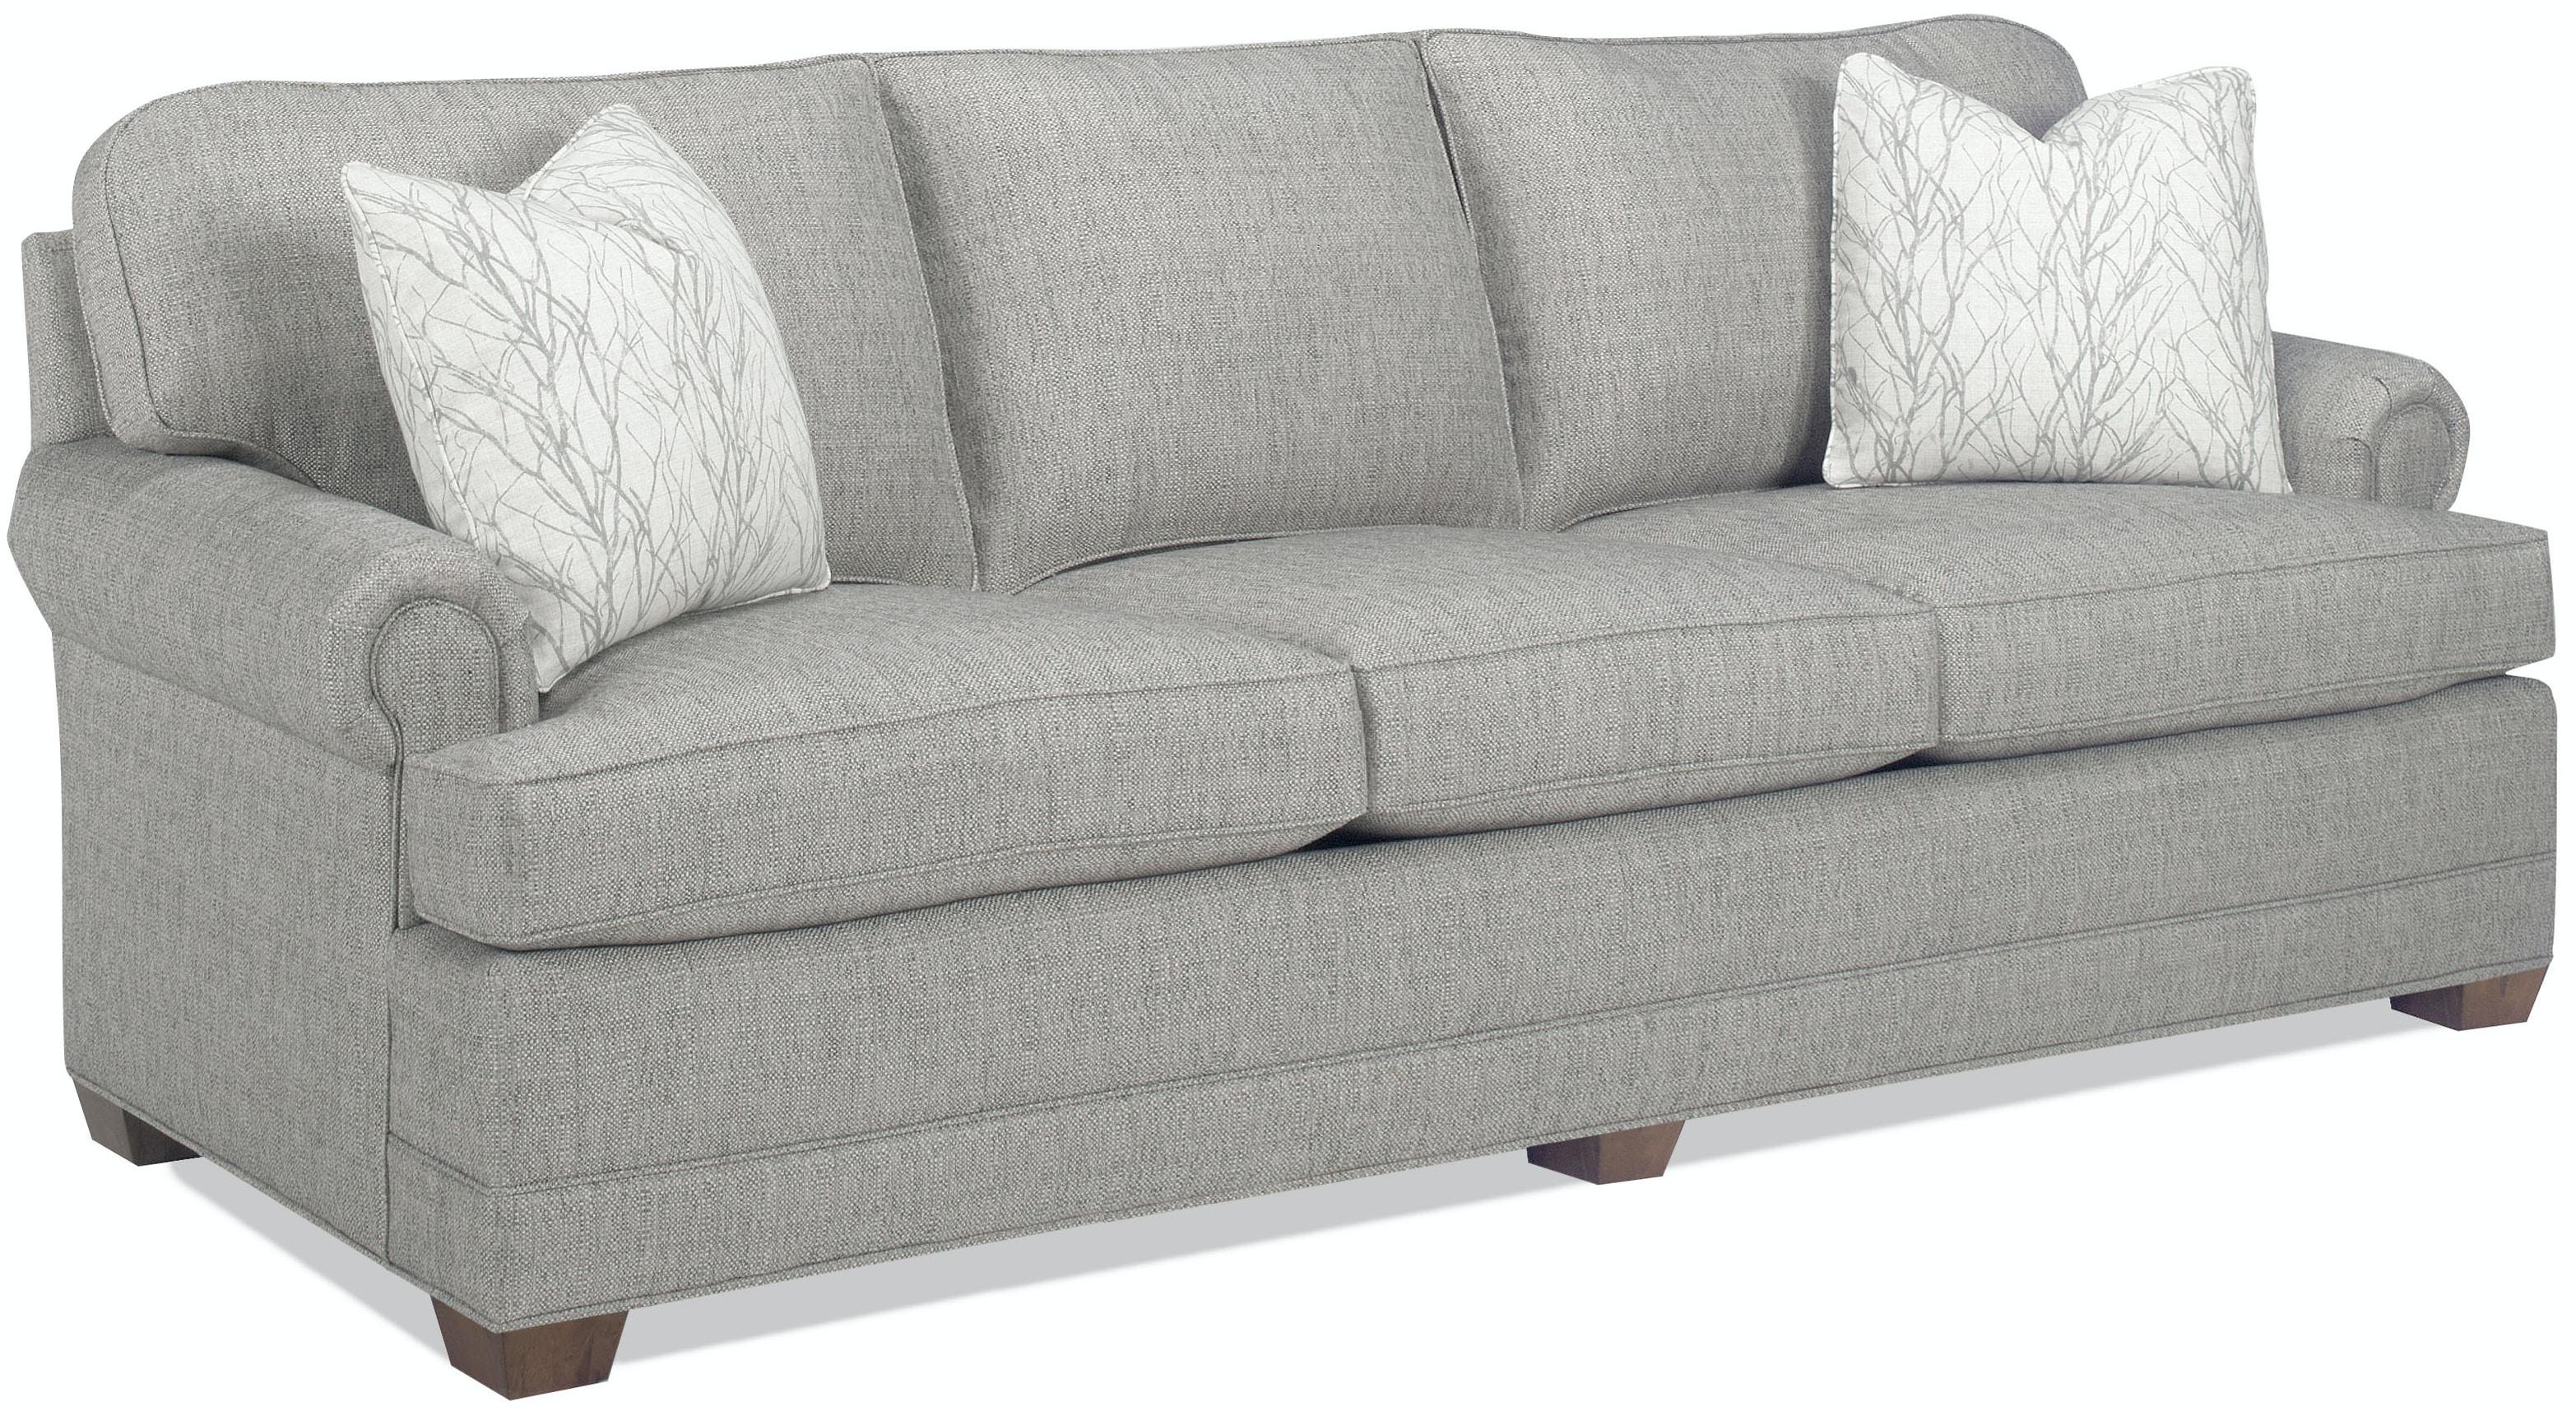 Charmant Temple Tailor Made Three Cushion Sofa 6630 95